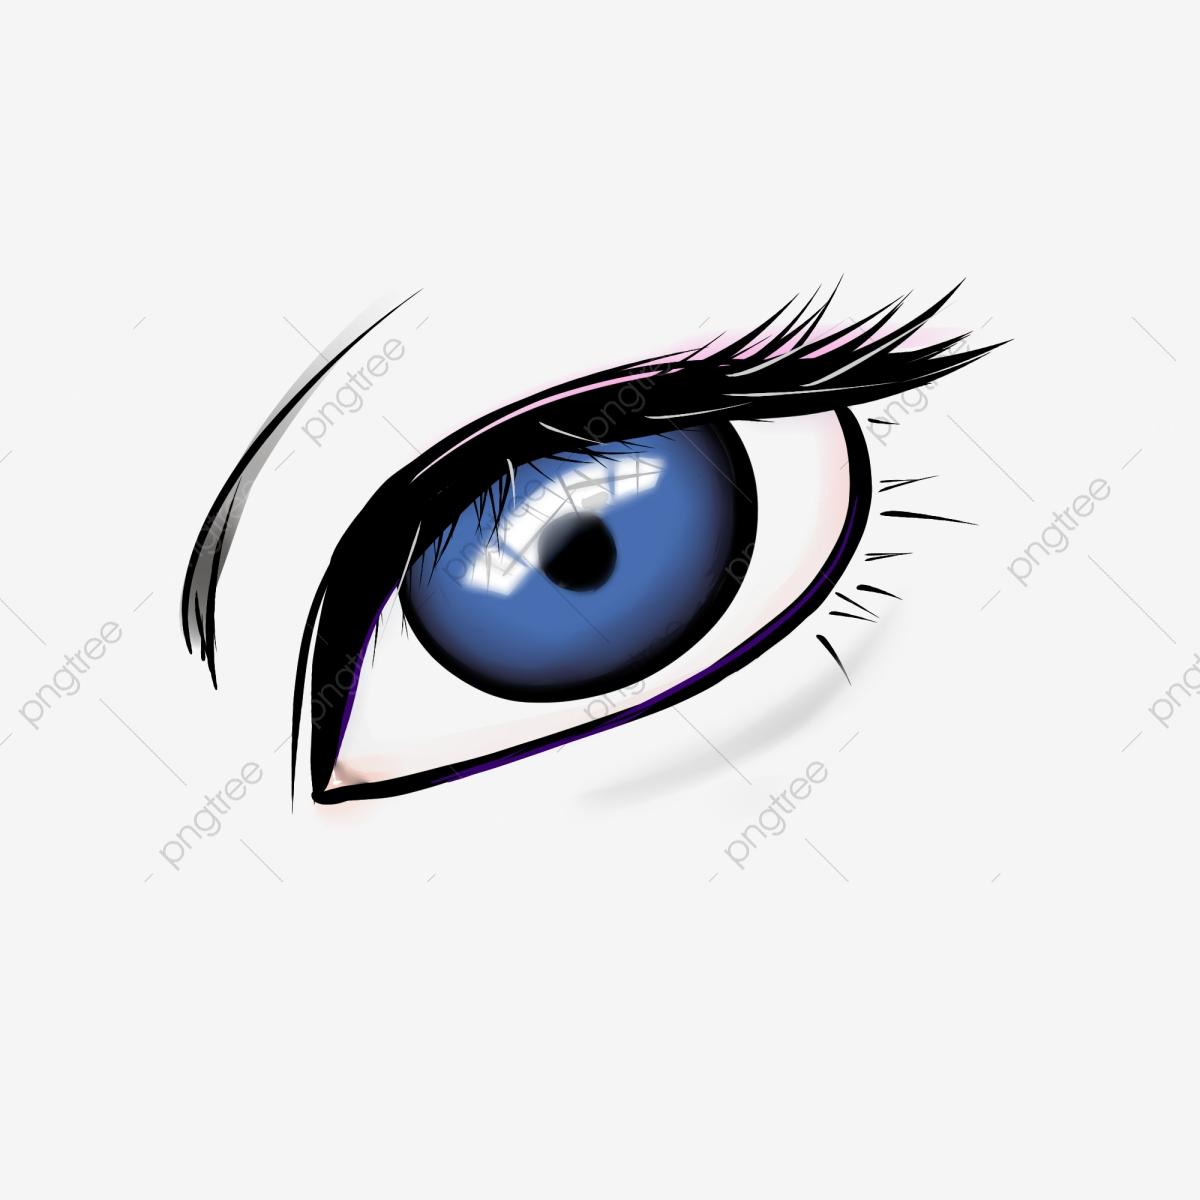 Eyelash clipart cartoon character. Eye long eyelashes blue